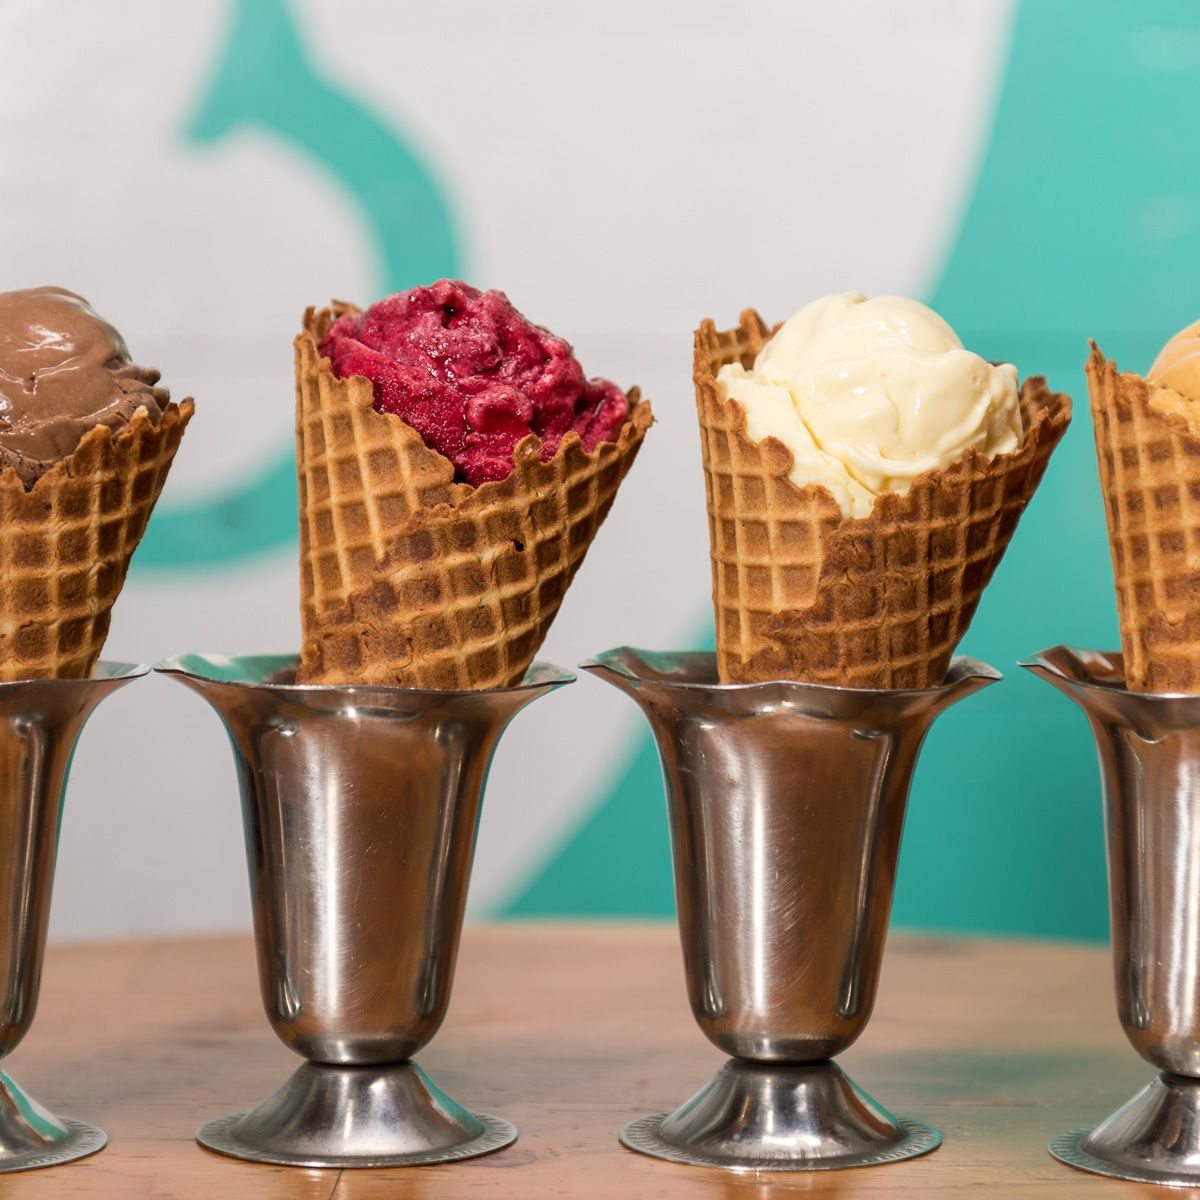 Best Ice Cream Spots in the U.S. Eating ice cream, Best